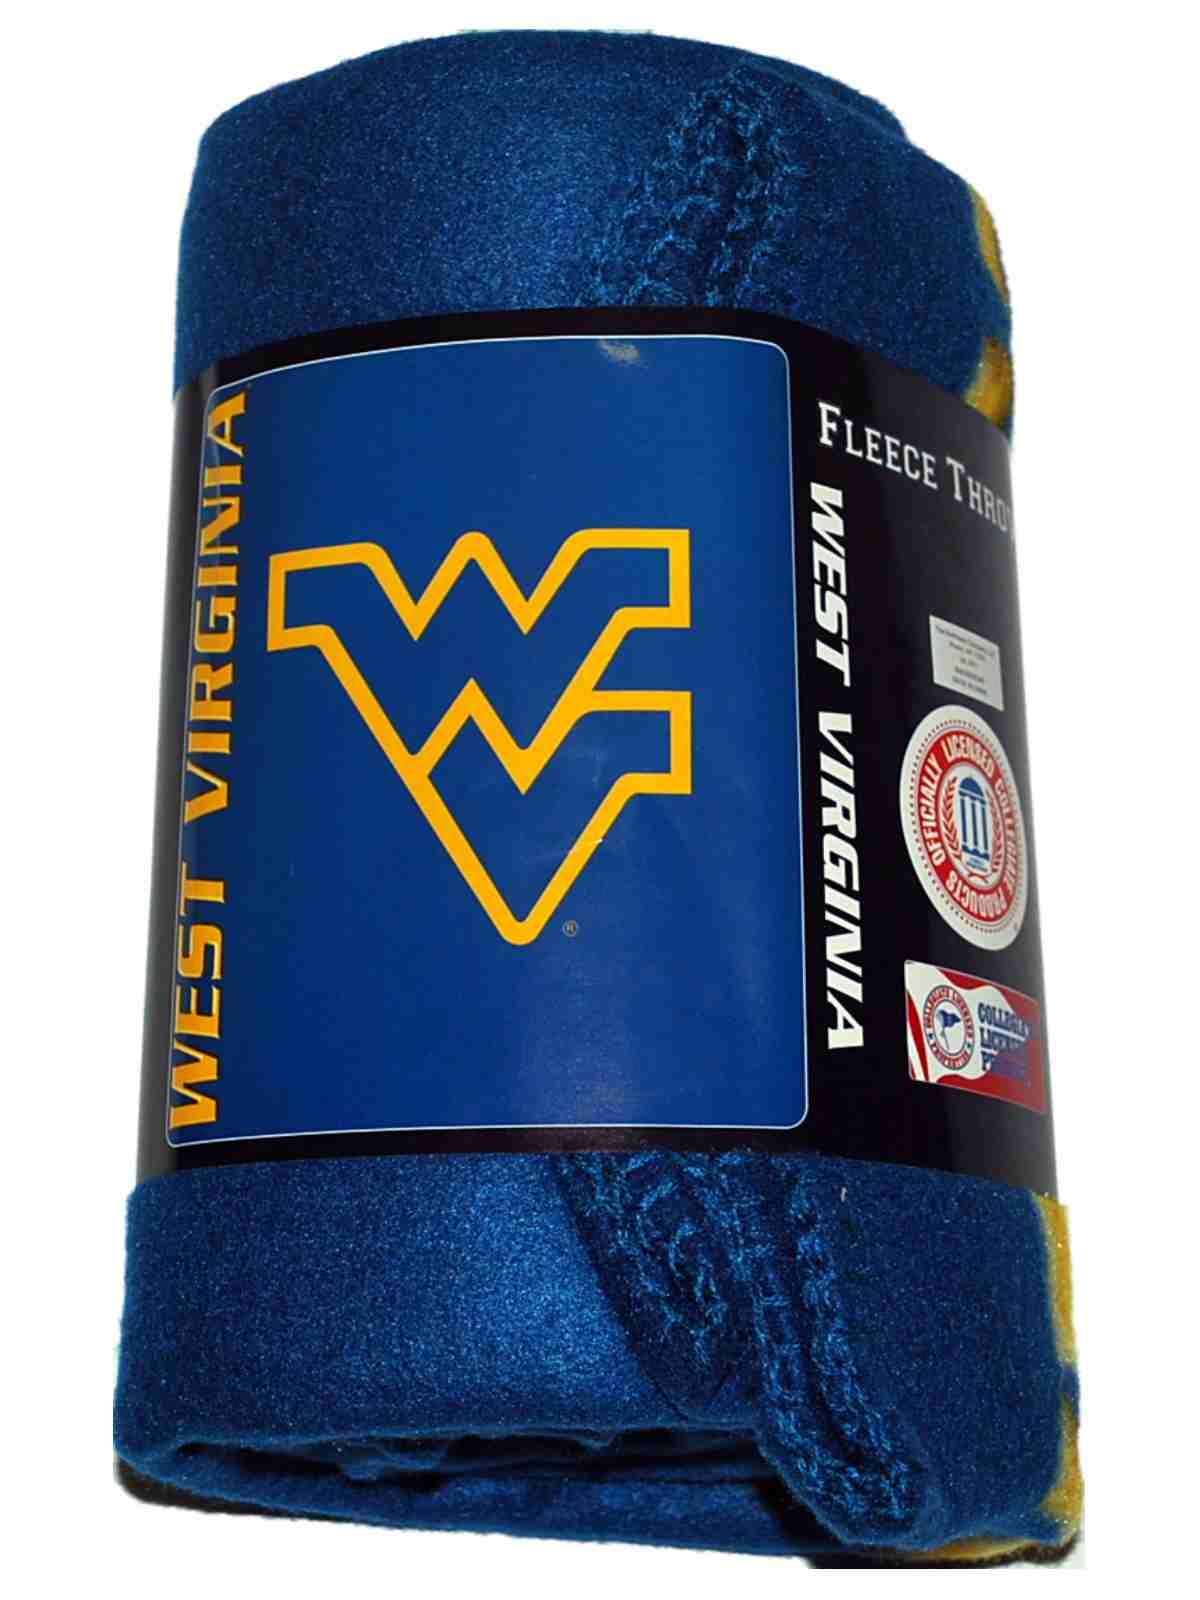 Northwest Company West Virginia Mountaineers Logo Northwest Co. Navy Fleece Throw Blanket 50